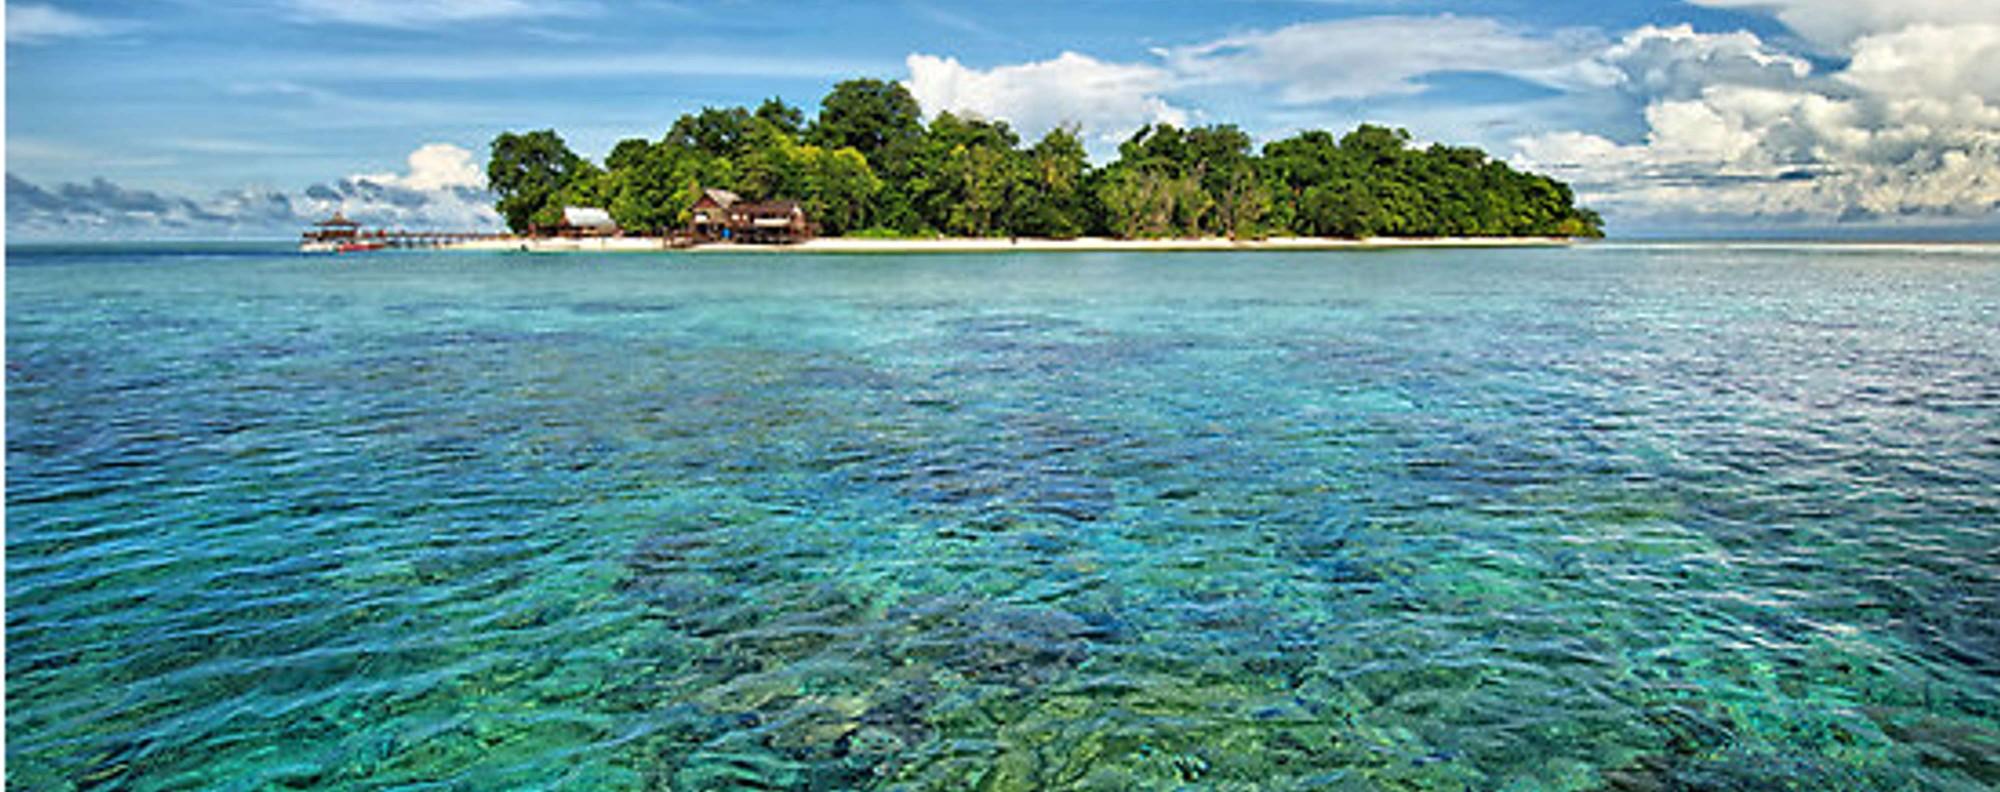 Sipadan Island off the east coast of Sabah. Photo: Karim Raslan